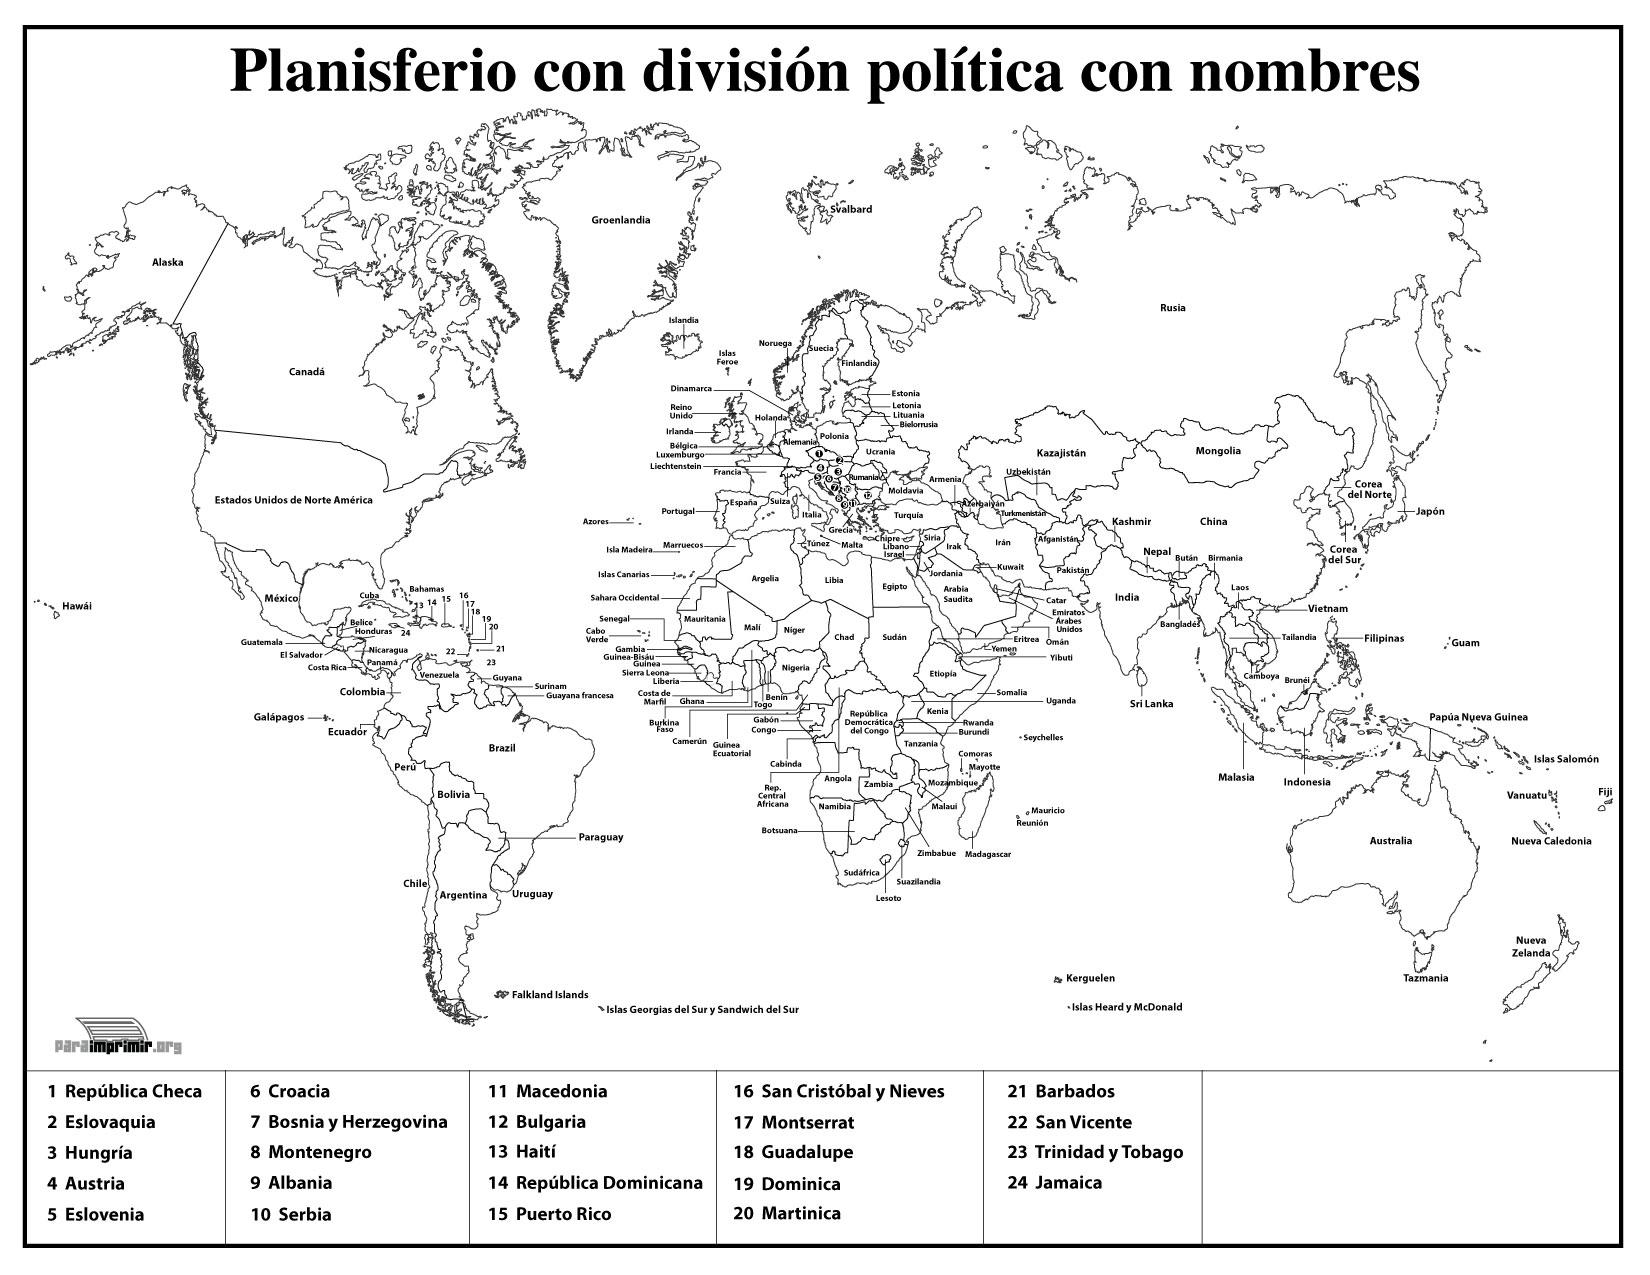 Mapamundi Con División Política Con Nombres Para Imprimir